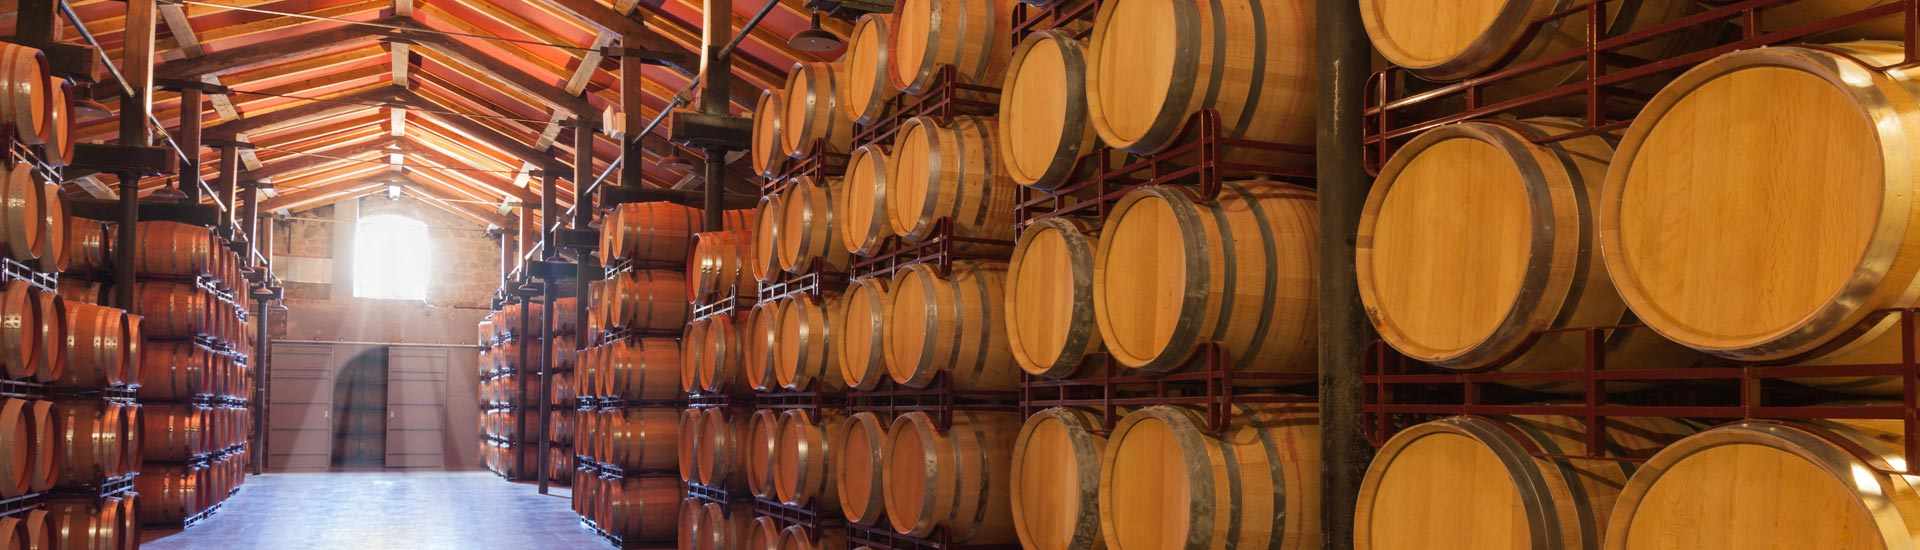 Wine Room Humidity